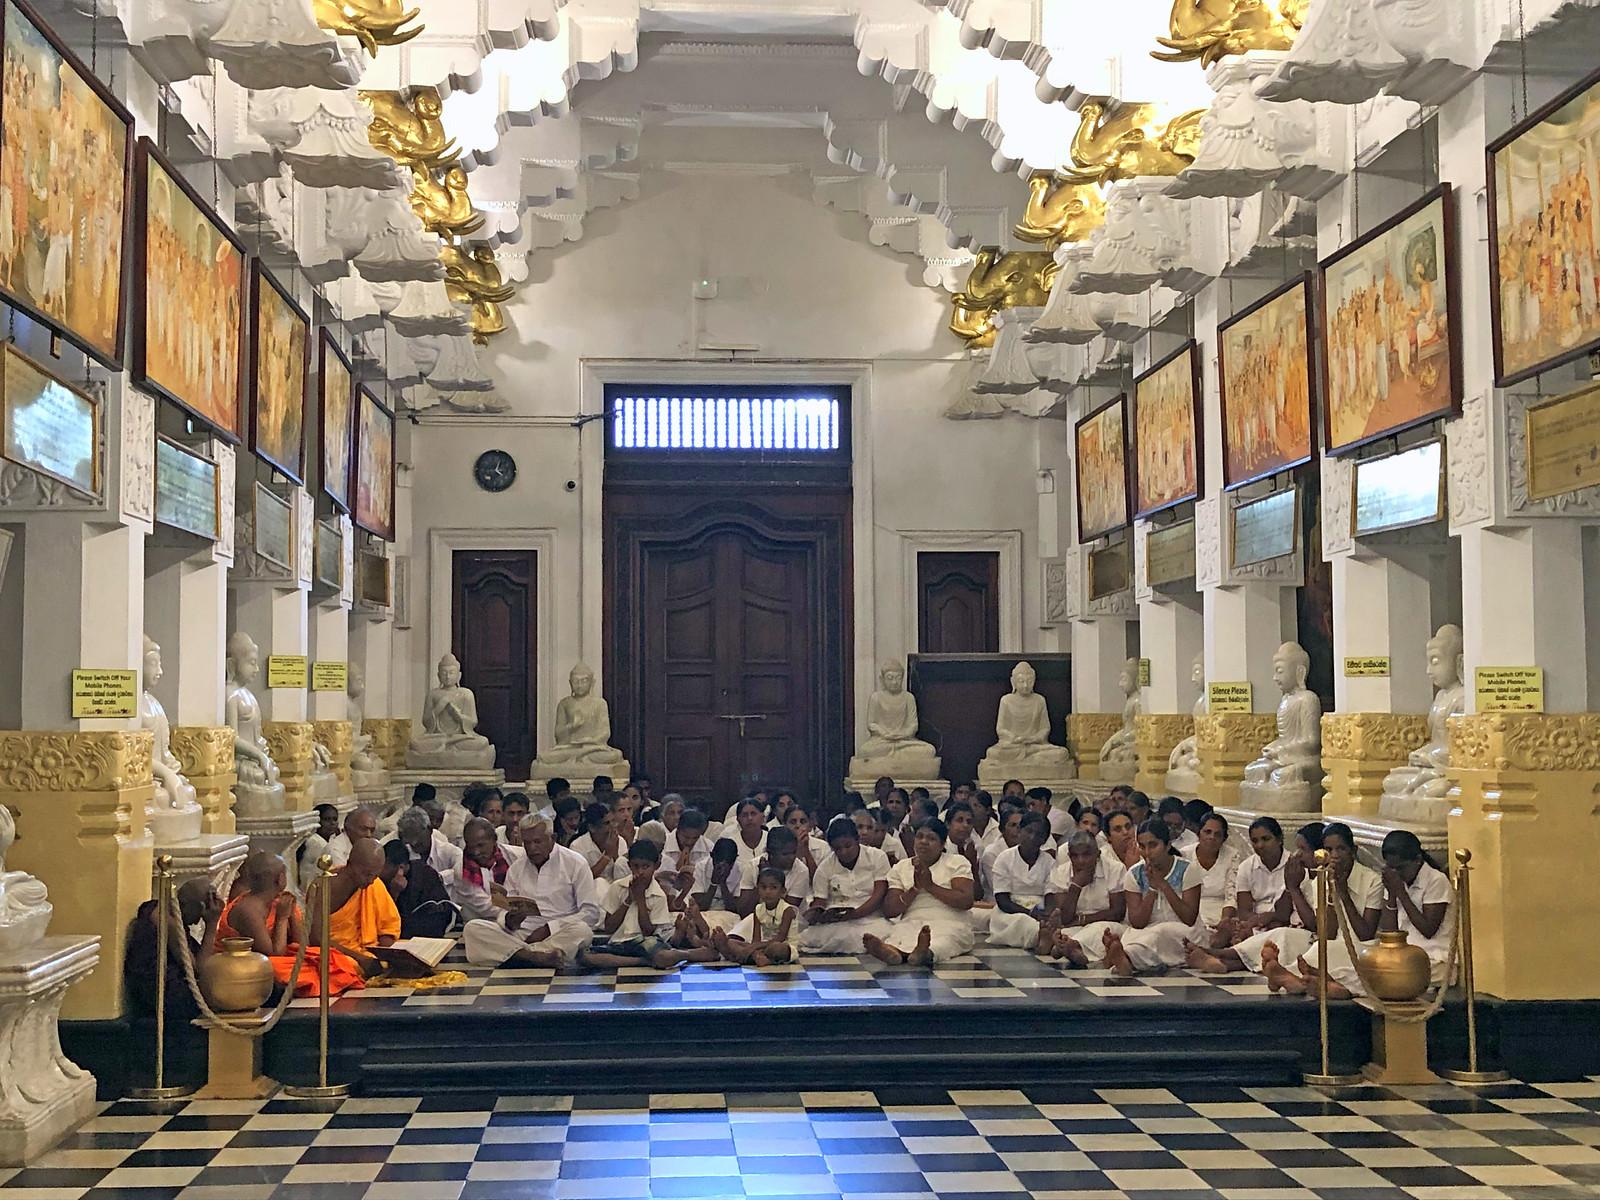 Kandy en un día, Sri Lanka kandy en un día - 47013340872 3831bc4a53 h - Kandy en un día, Sri Lanka